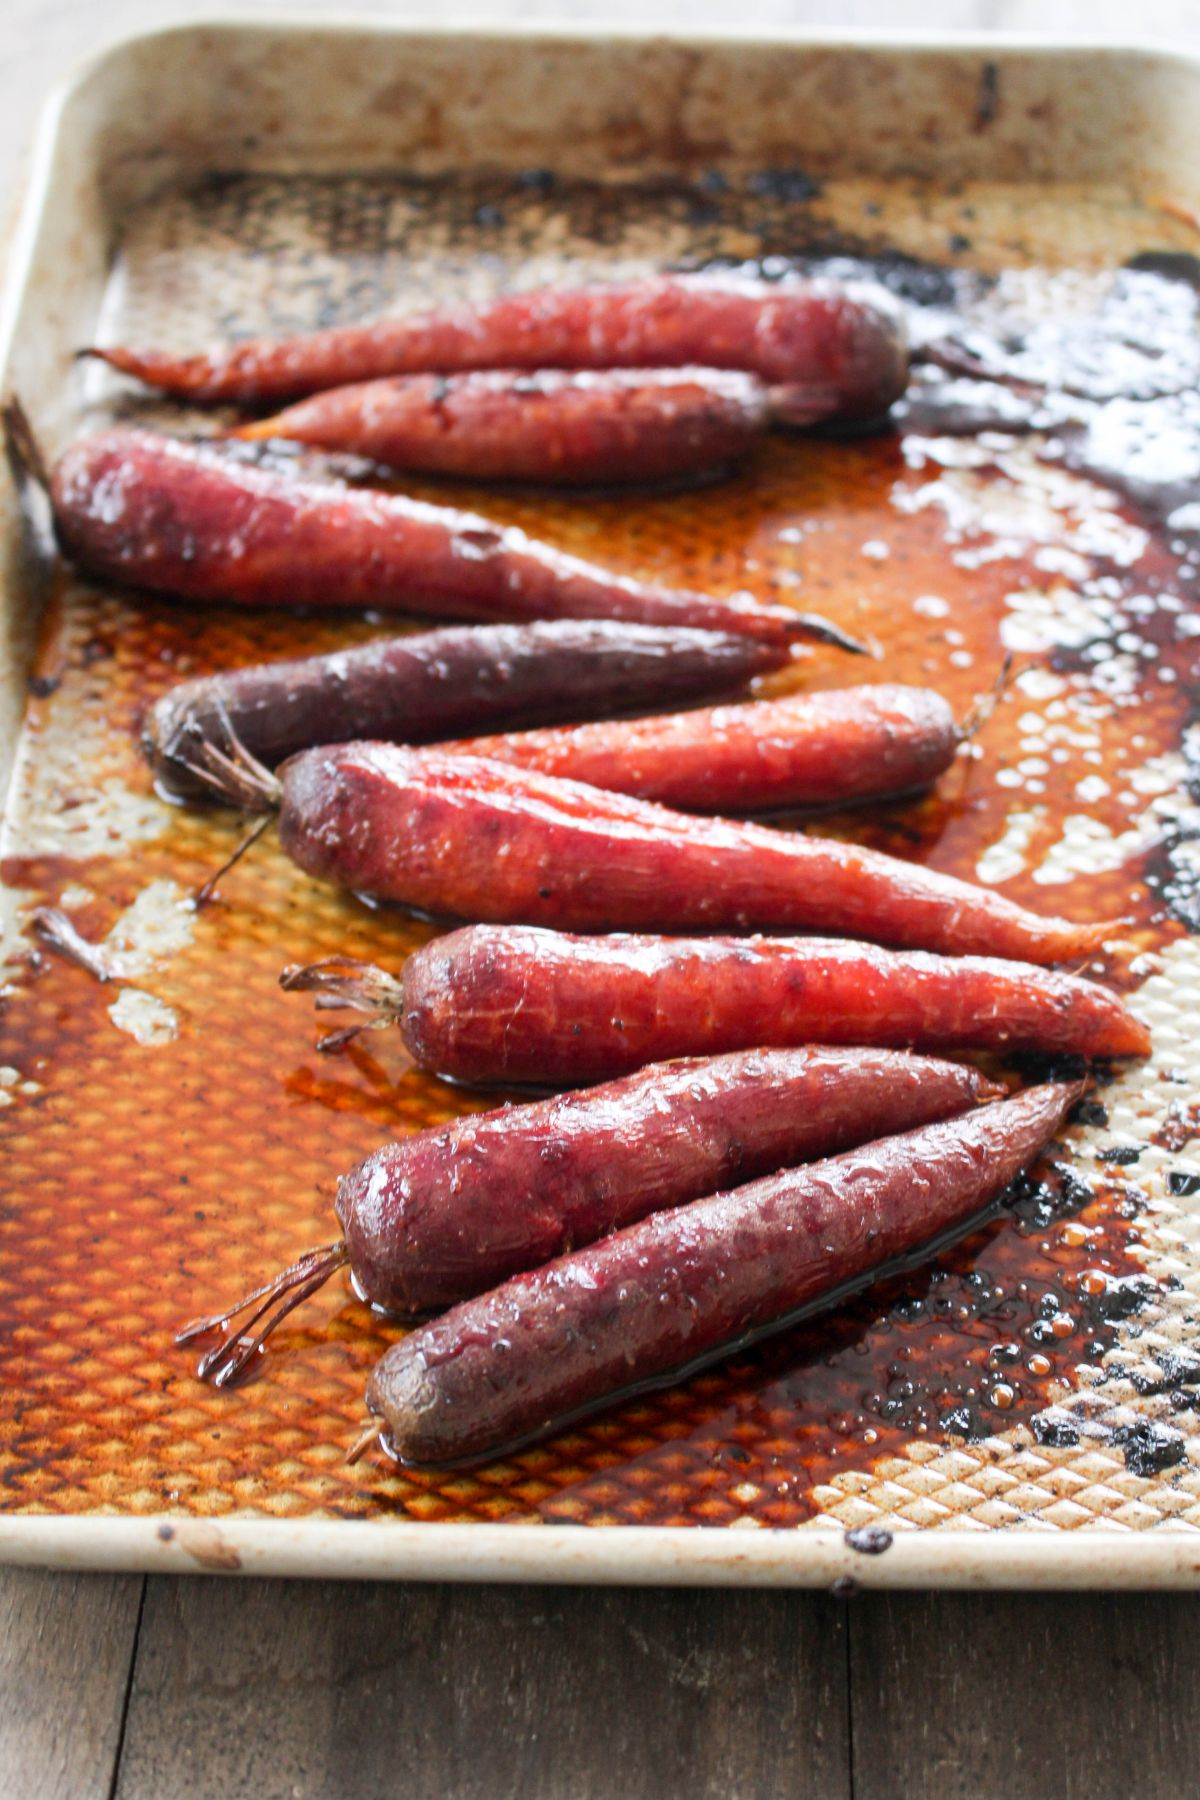 Farmers market carrots bake 3 minutes